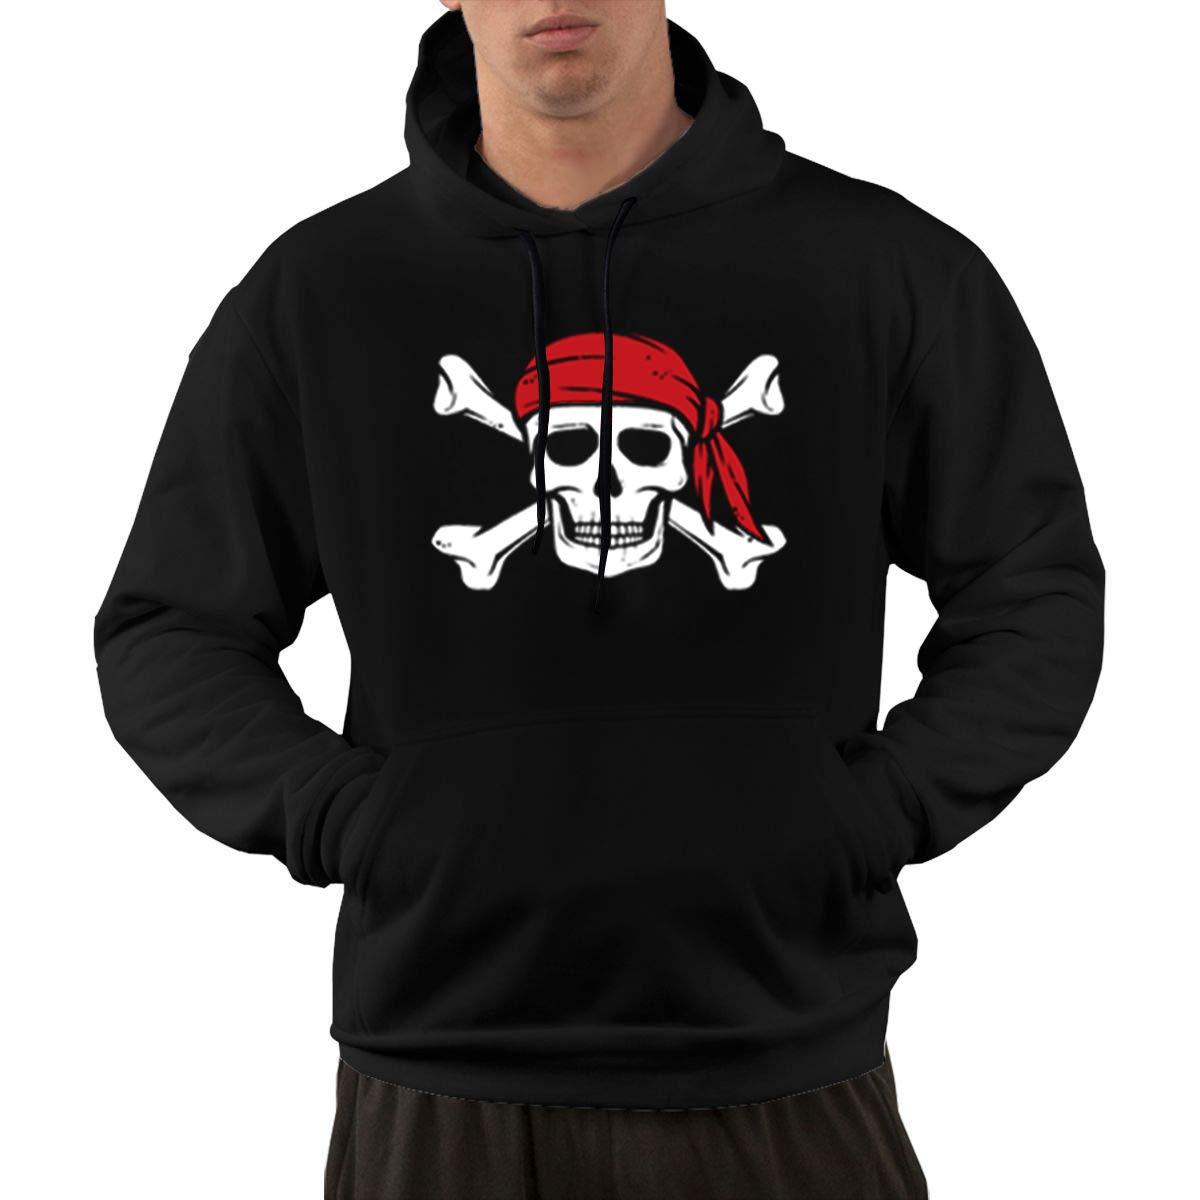 hodmadod Black Cool Pirate Skull Crossbones Hoodie - Crewneck College Sweatshirts Graphic Hooded Pullover Hoody with Pockets